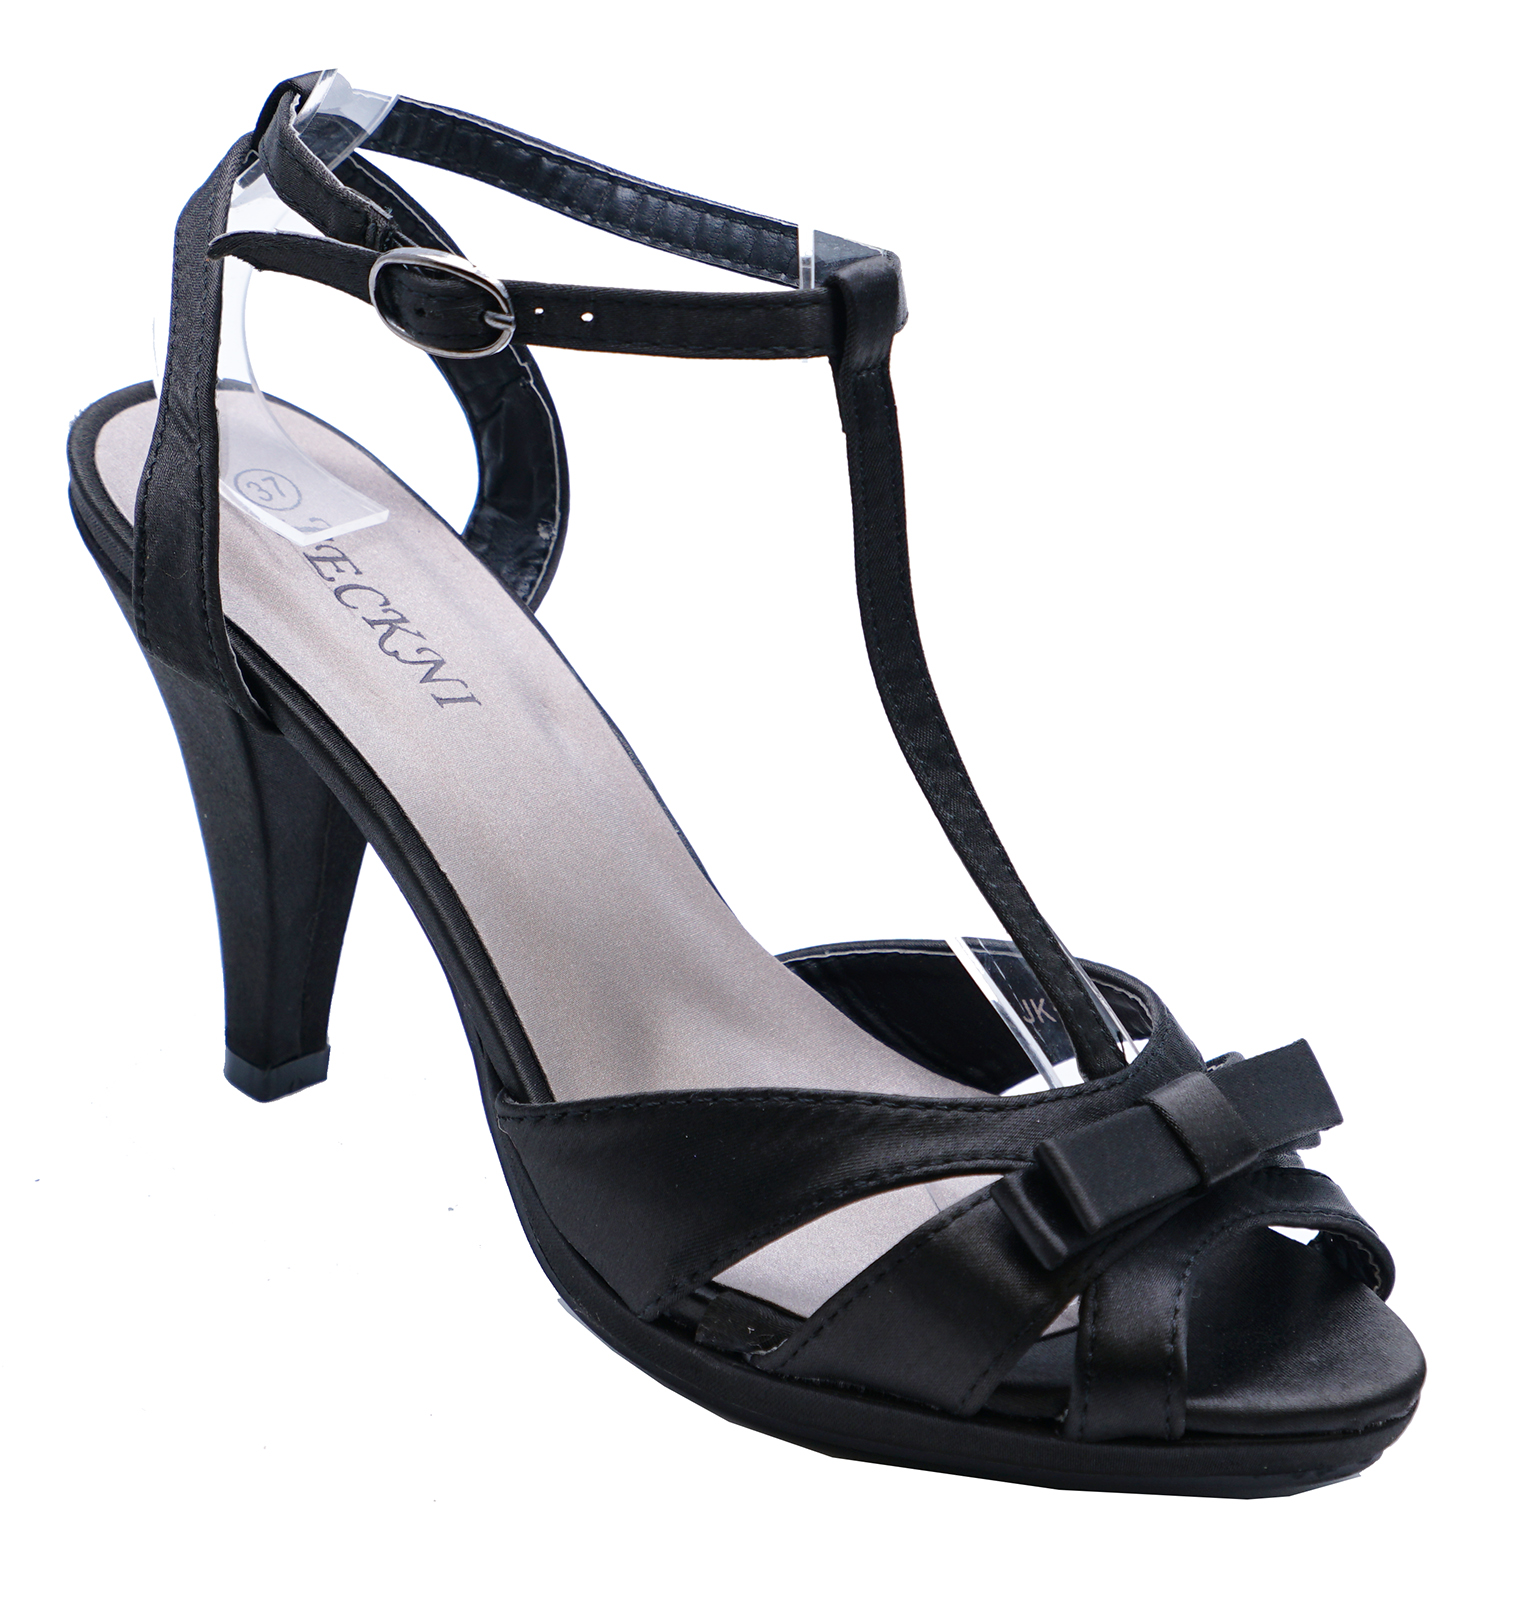 LADIES BLACK SATIN STRAPPY SLIP-ON PEEP-TOE EVENING SHOES T-BAR SANDALS UK 3-8